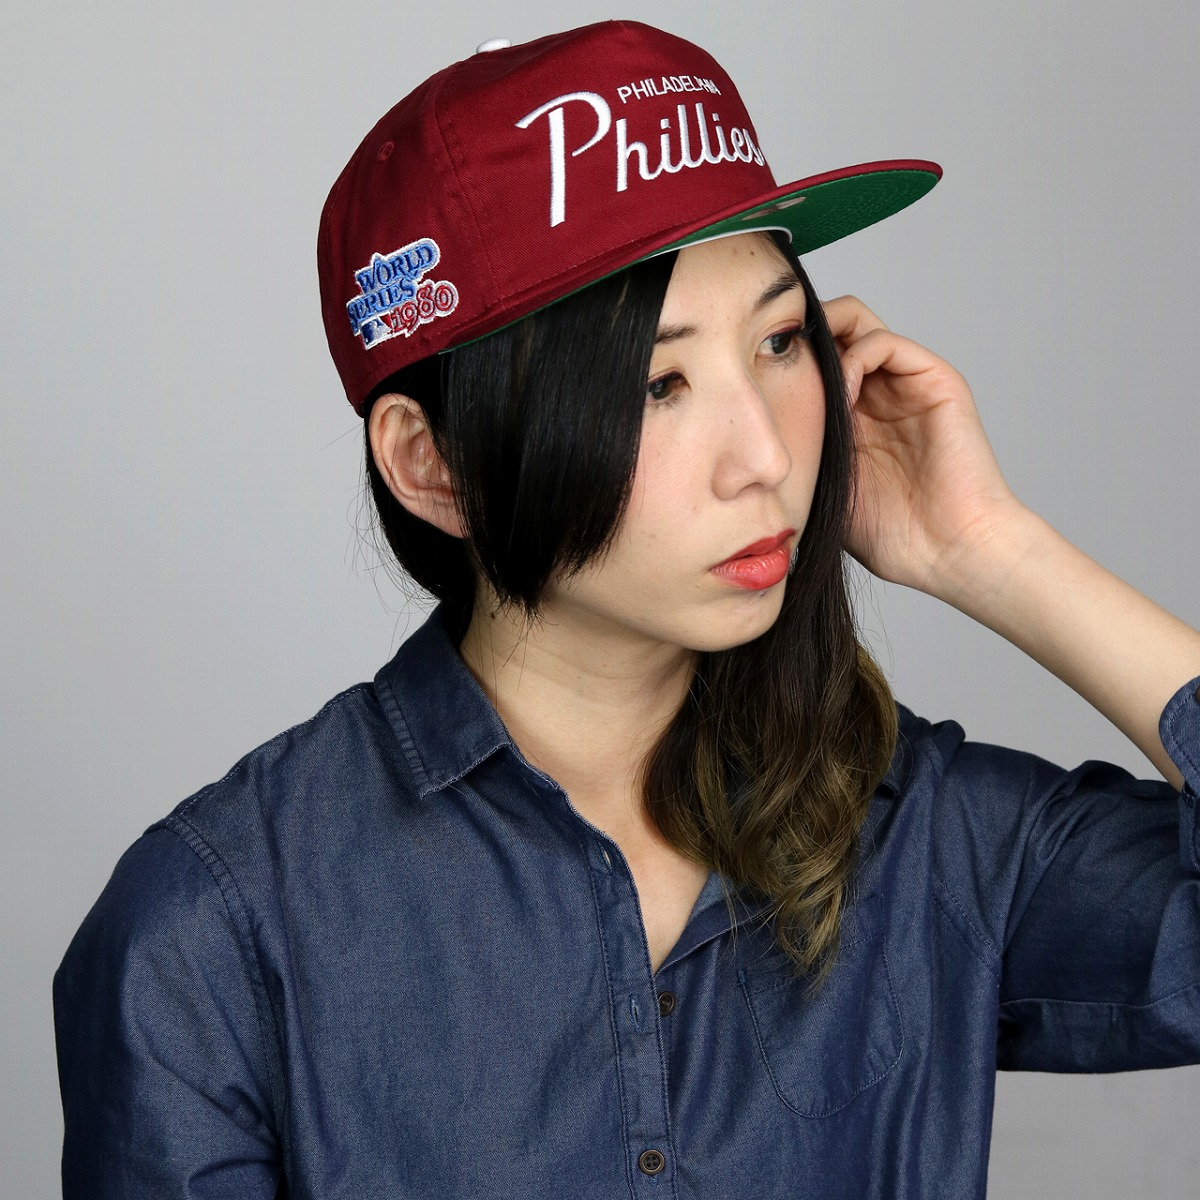 5e2ab661855 New era Cap mens 9 FIFTY all season NEWERA hats Philadelphia Phillies new  era retro baseball cap logo Cap Women s casual baseball cap stylish popular  Red of ...